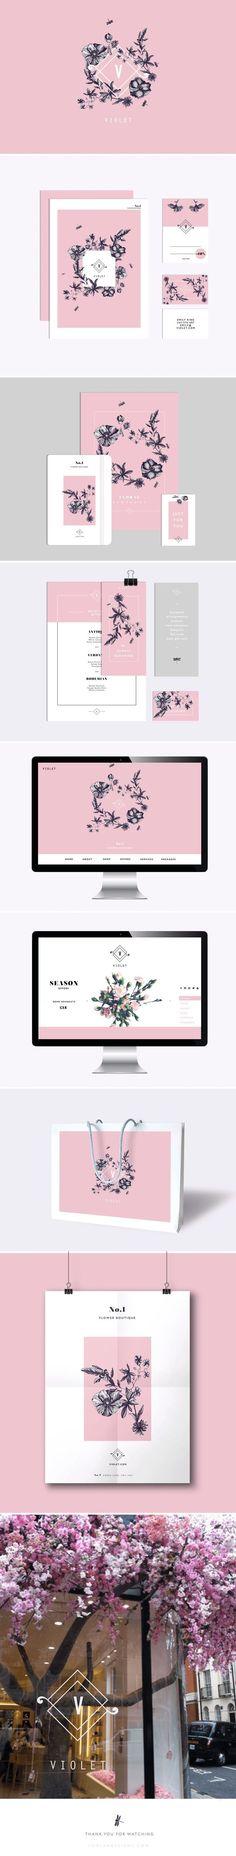 Branding and logo design / hand drawn boho flowers + pink + grey // http://loolaadesigns.com: http://loolaadesigns.comviolet-branding/?utm_content=bufferd9ea2&utm_medium=social&utm_source=pinterest.com&utm_campaign=buffer